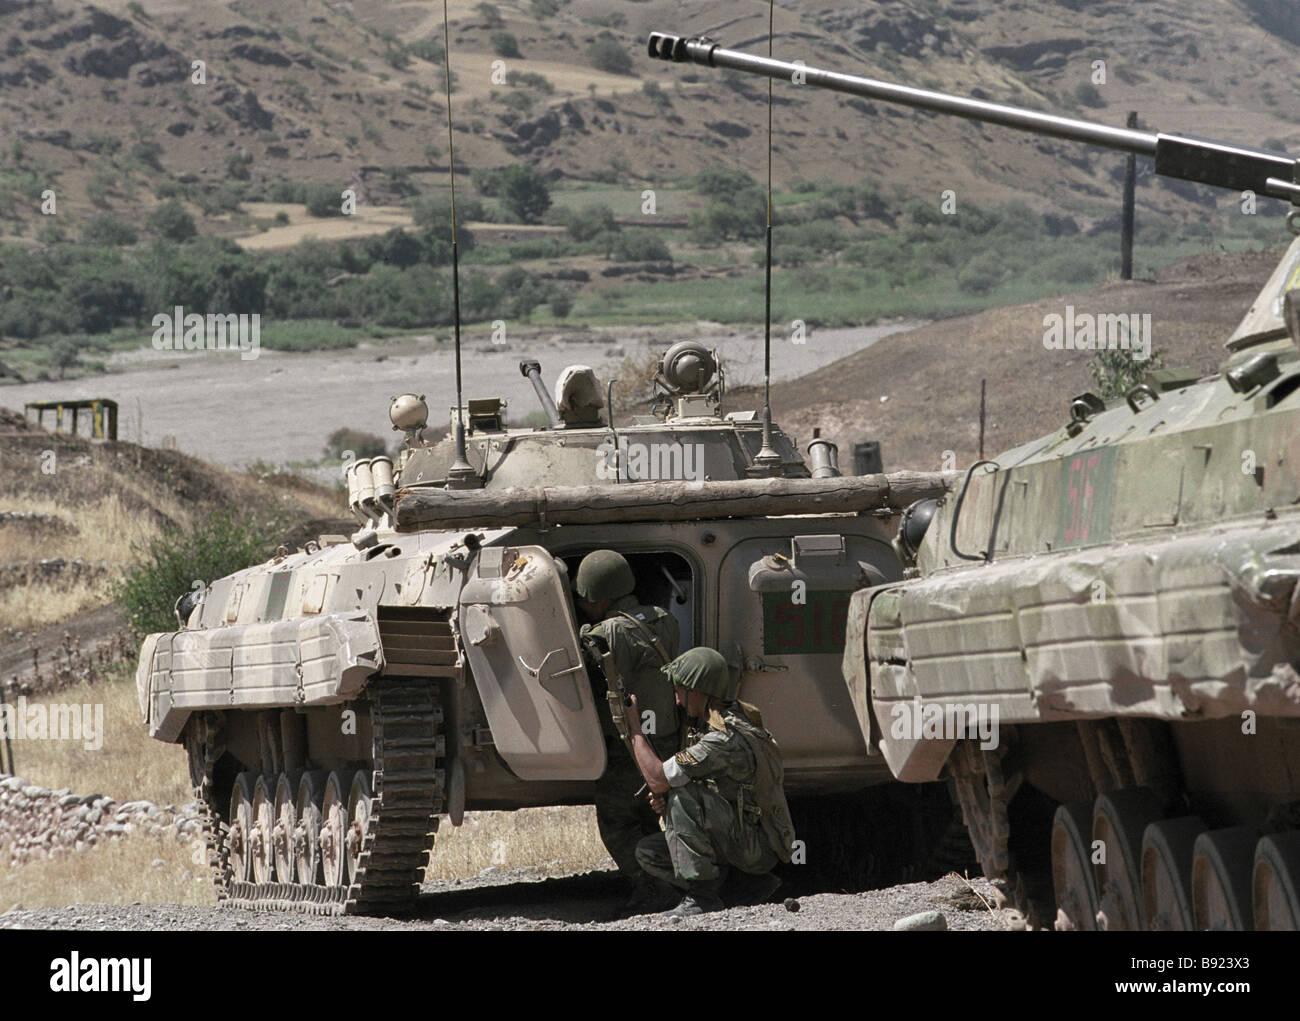 Motorized rifle regiment of 201 st motorized rifle division near Pyandzh River - Stock Image